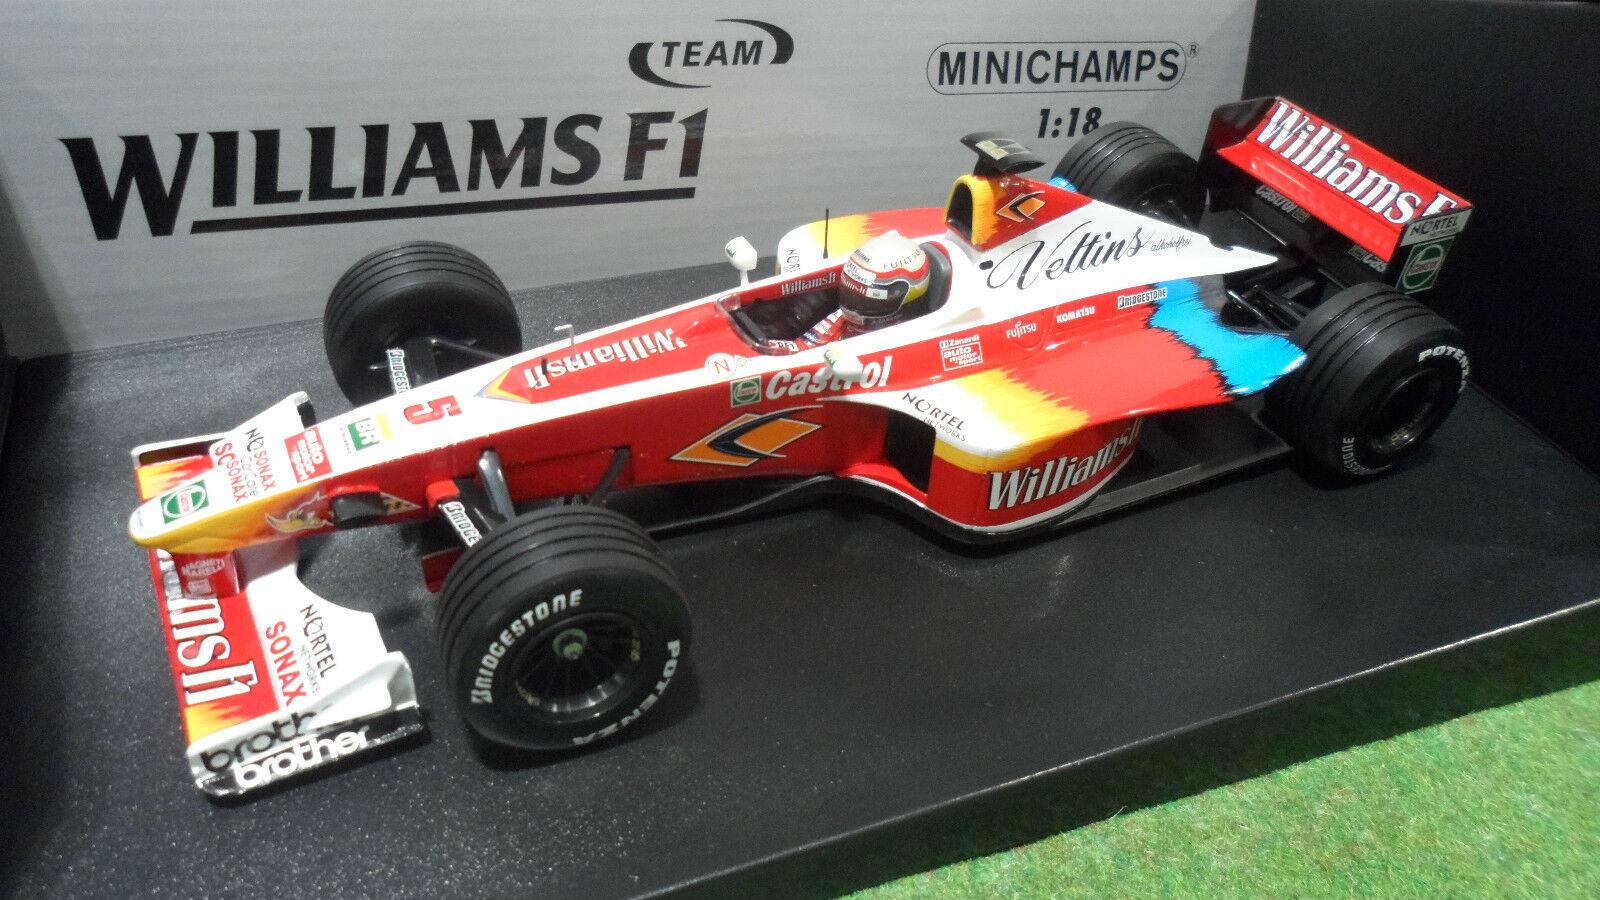 hermoso F1 WILLIAMS FW21 ZANARDI 1999 súperTEC 1 18 MINICHAMPS 180990005 180990005 180990005 miniature  en promociones de estadios